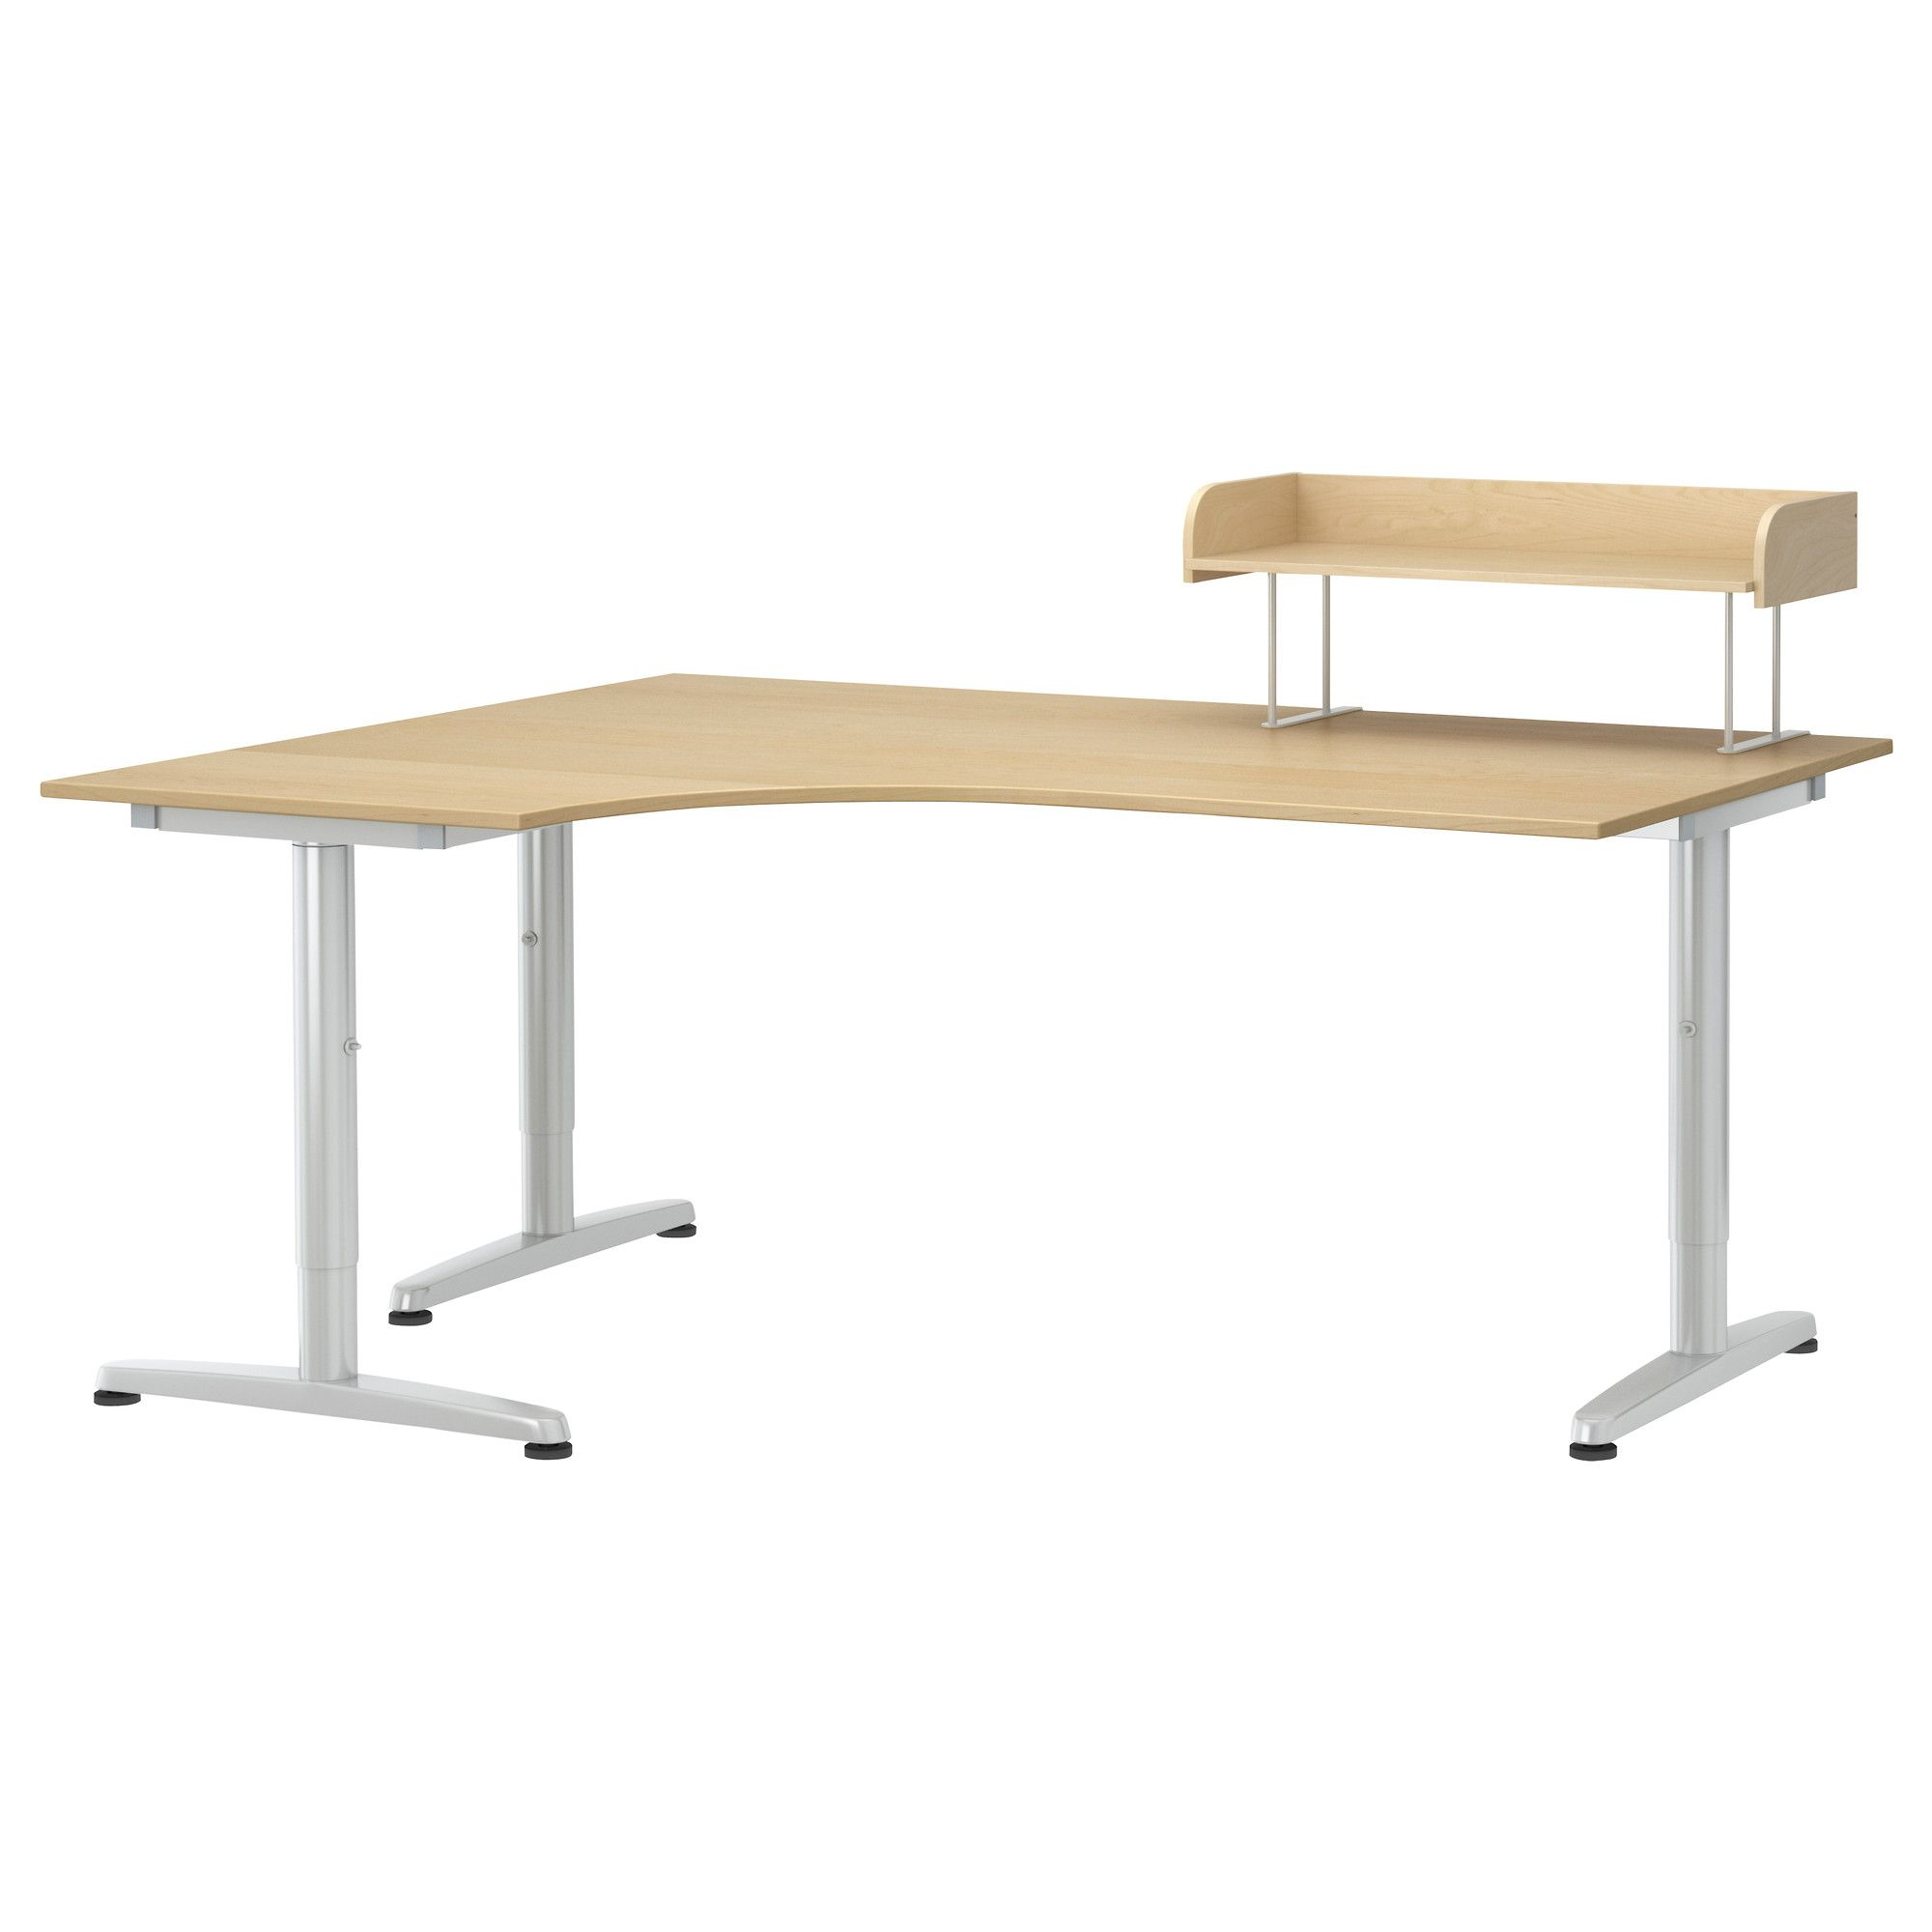 Ikea Us Furniture And Home Furnishings Corner Desk Ikea Writing Desk Ikea Desk